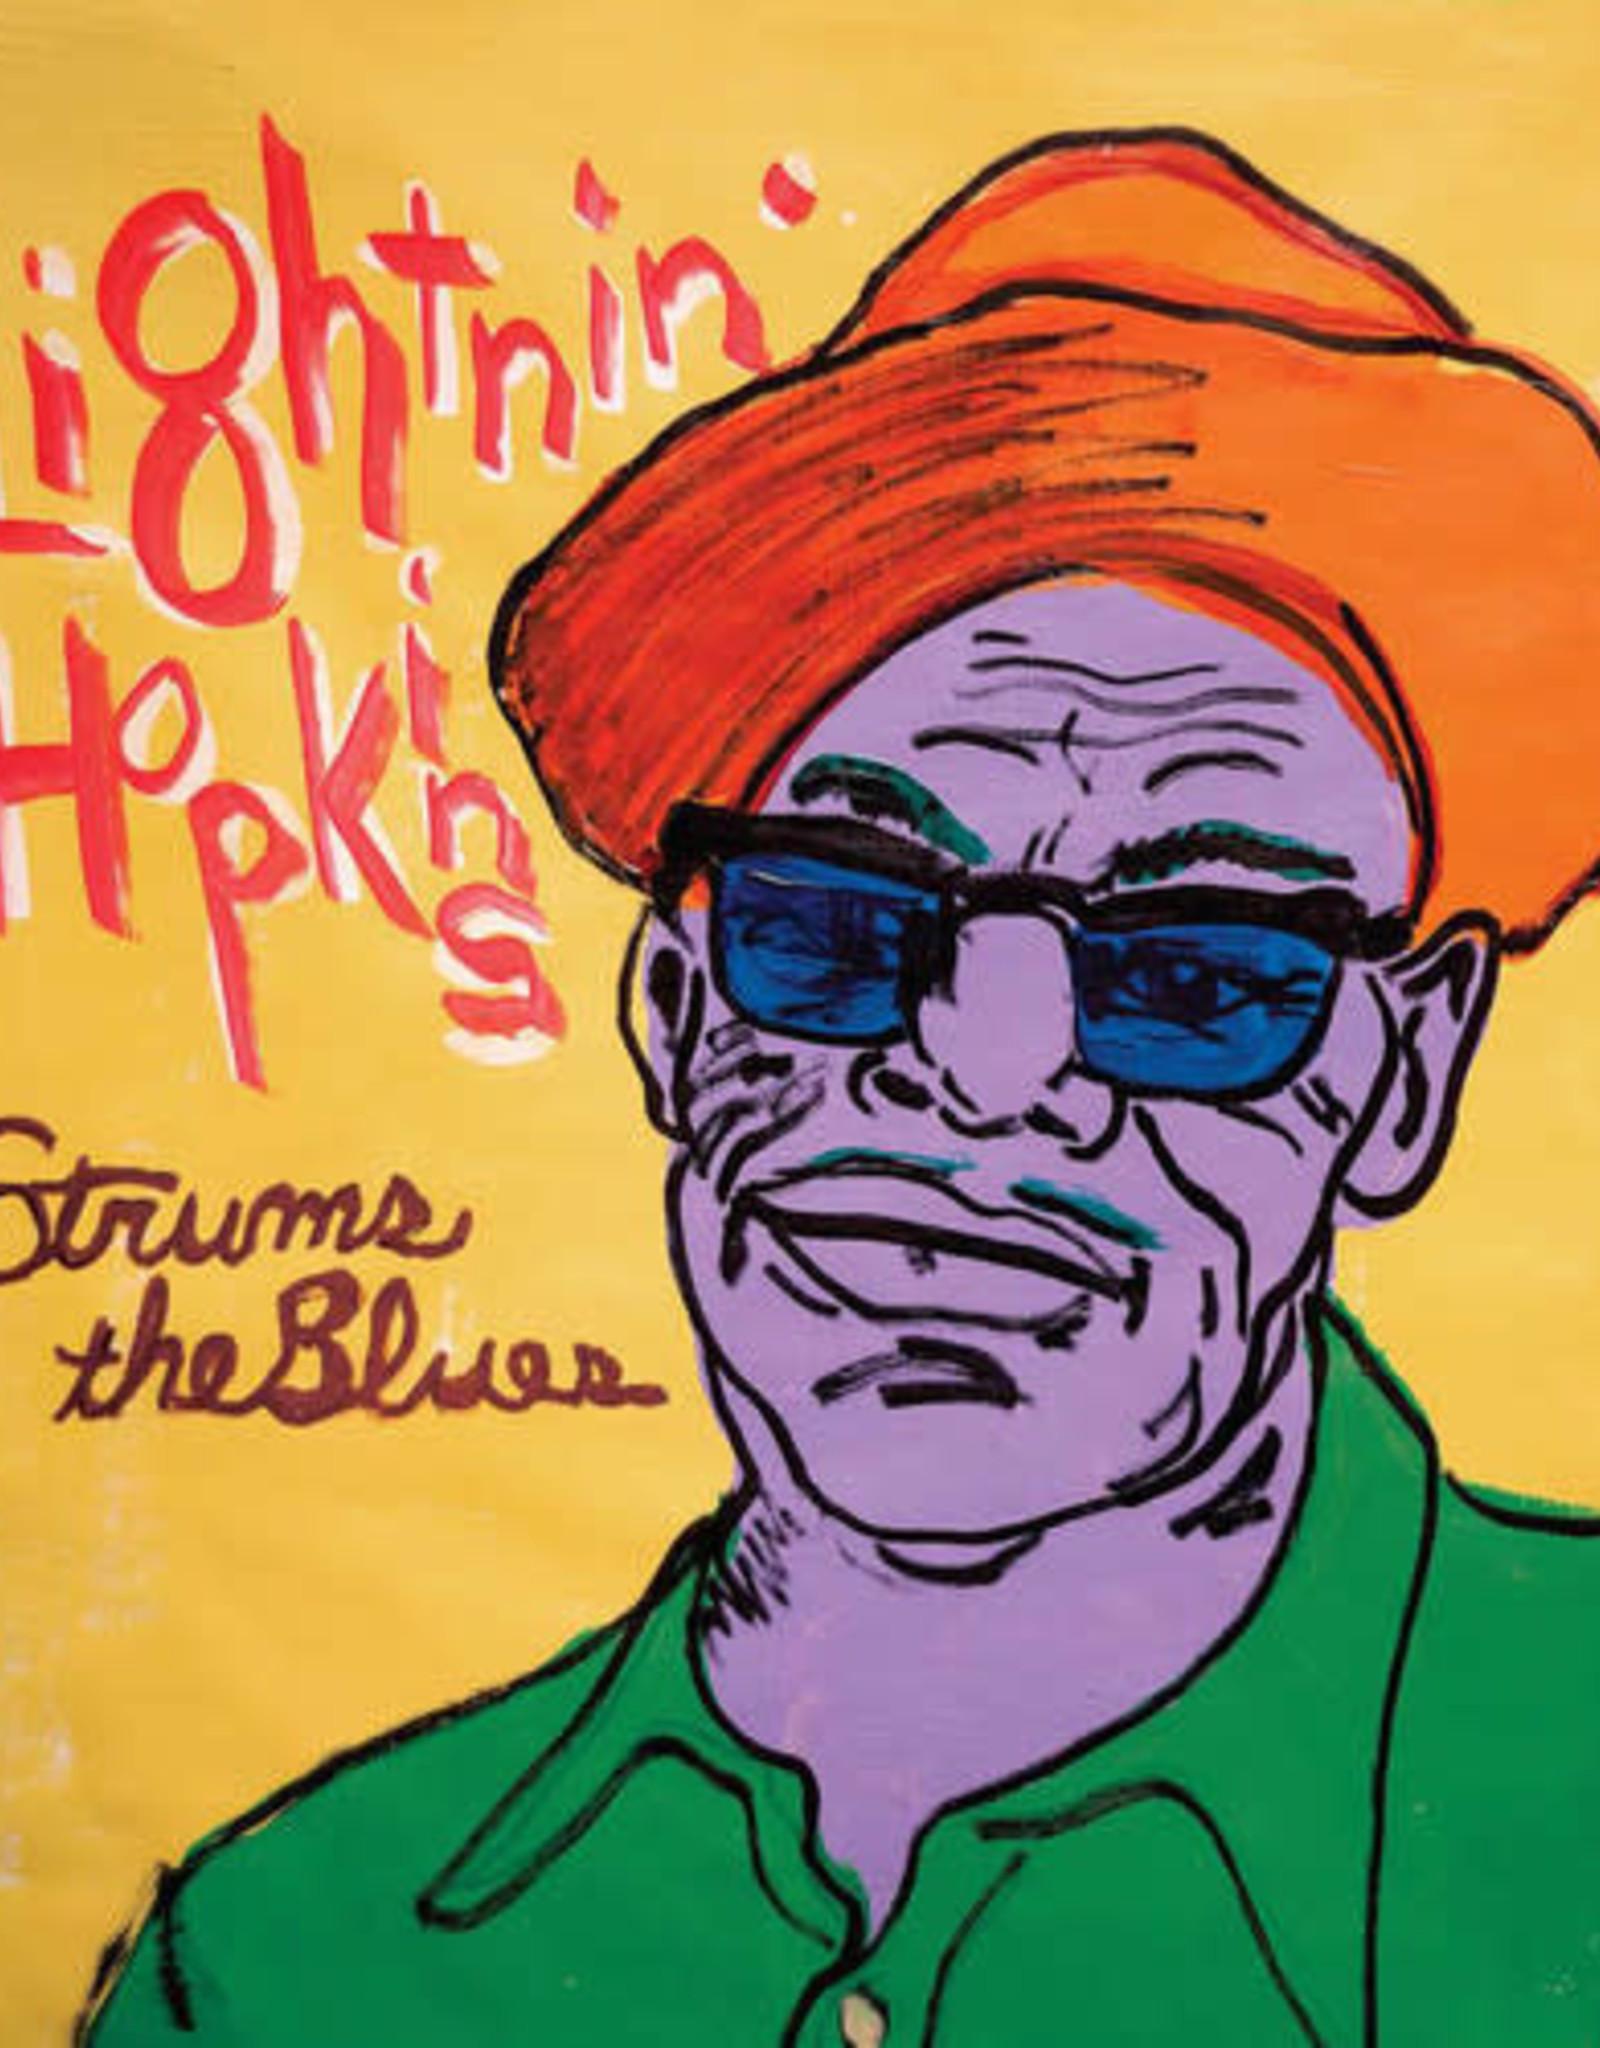 Lightnin' Hopkins - Strums the Blues